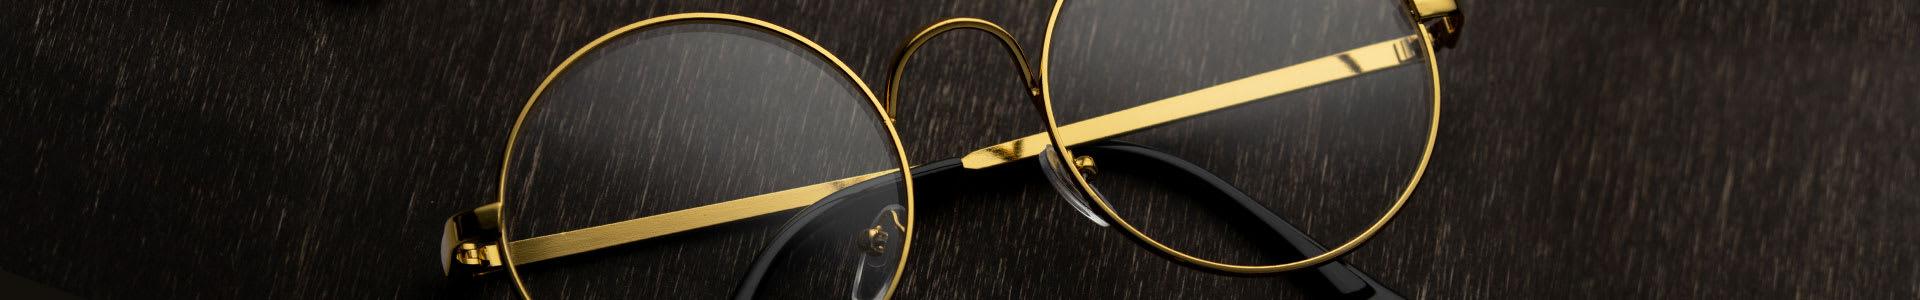 Gold Eyeglasses & Sunglasses